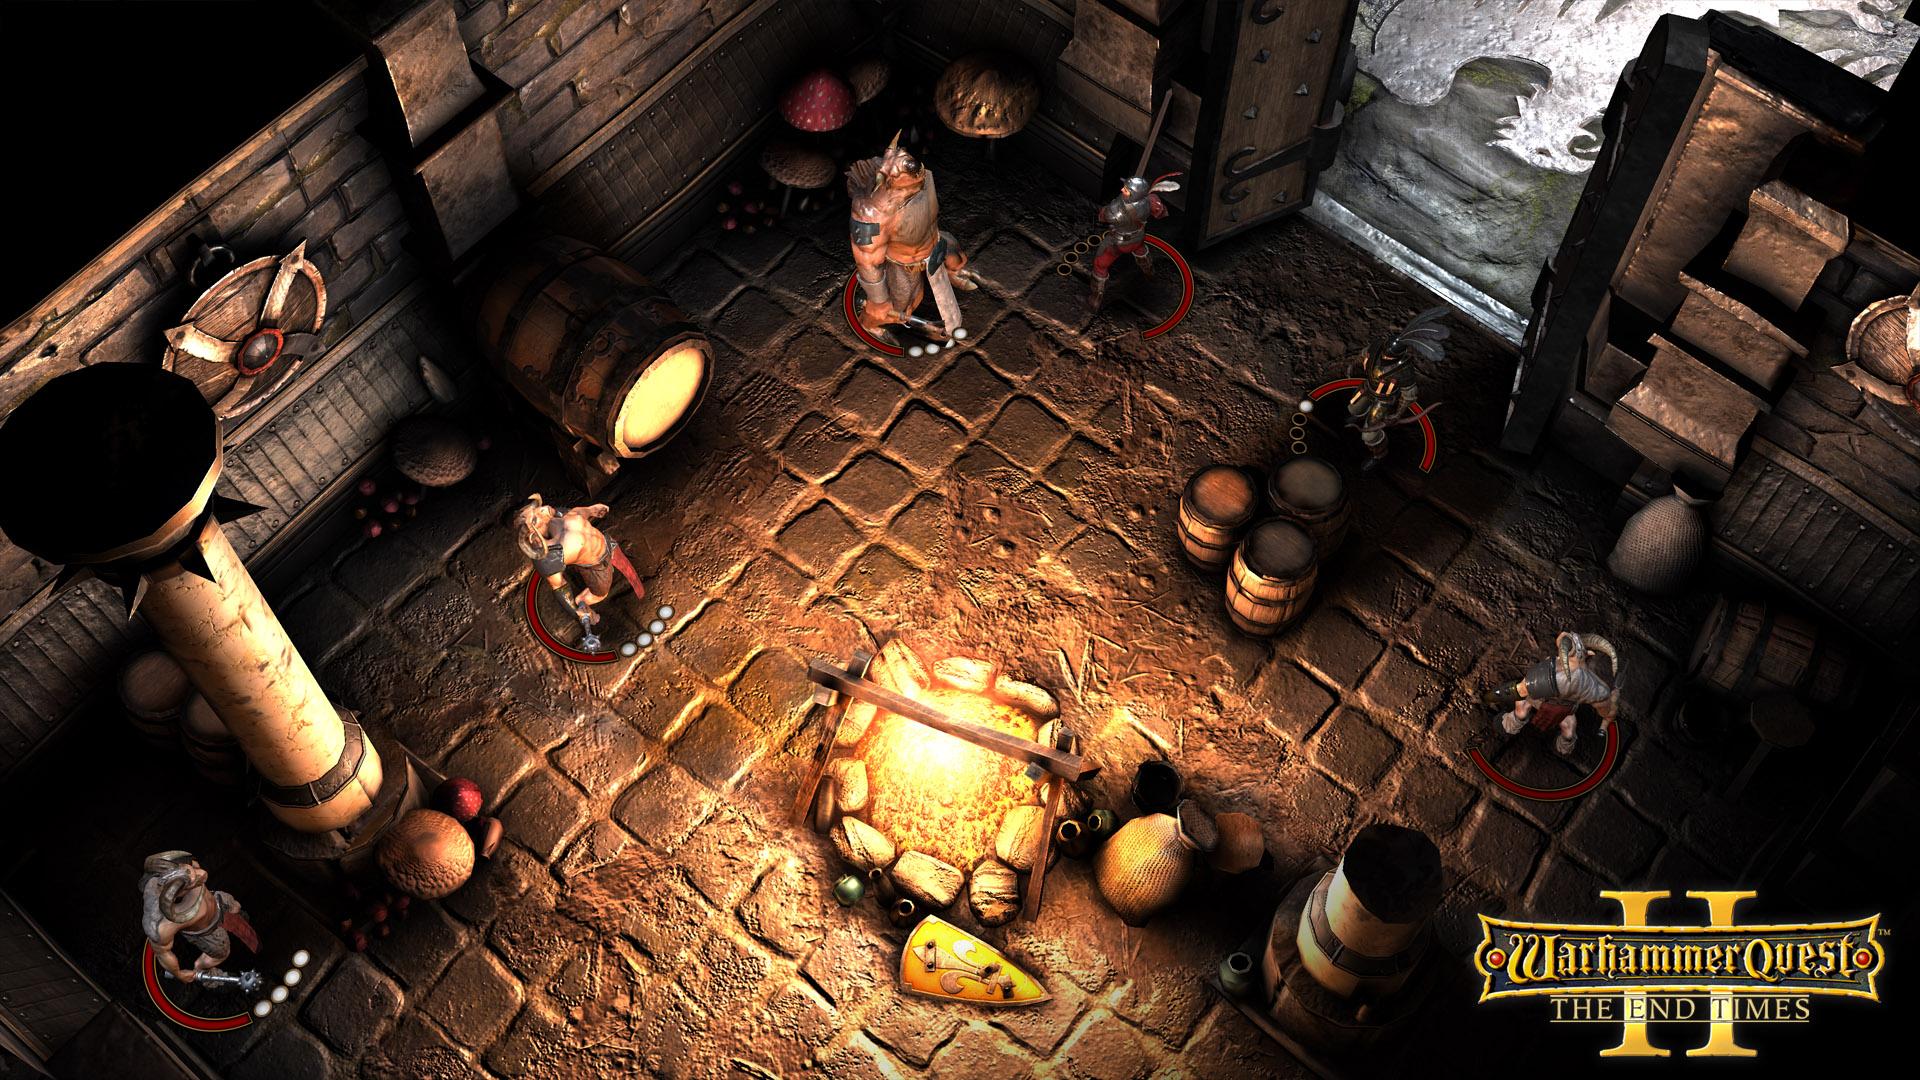 Na podzim oznámen Warhammer Quest 2 140580